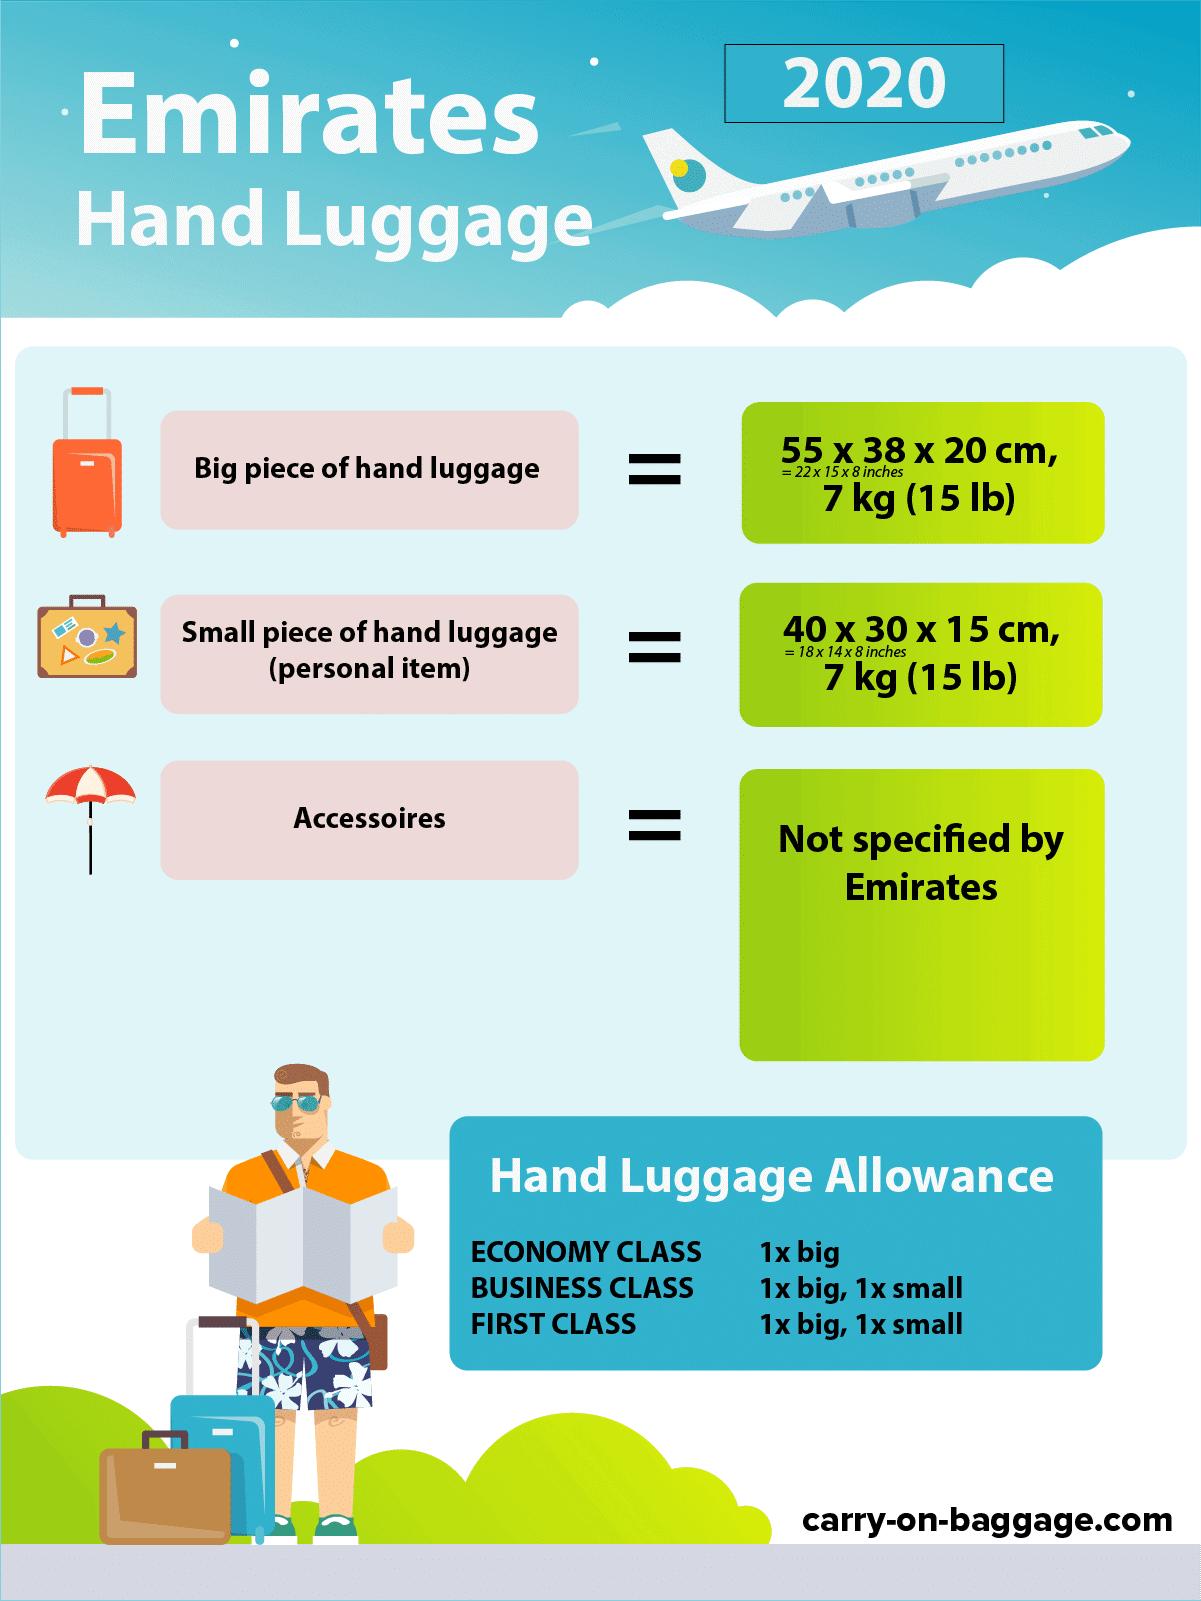 Emirates Hand Luggage Allowance 2020